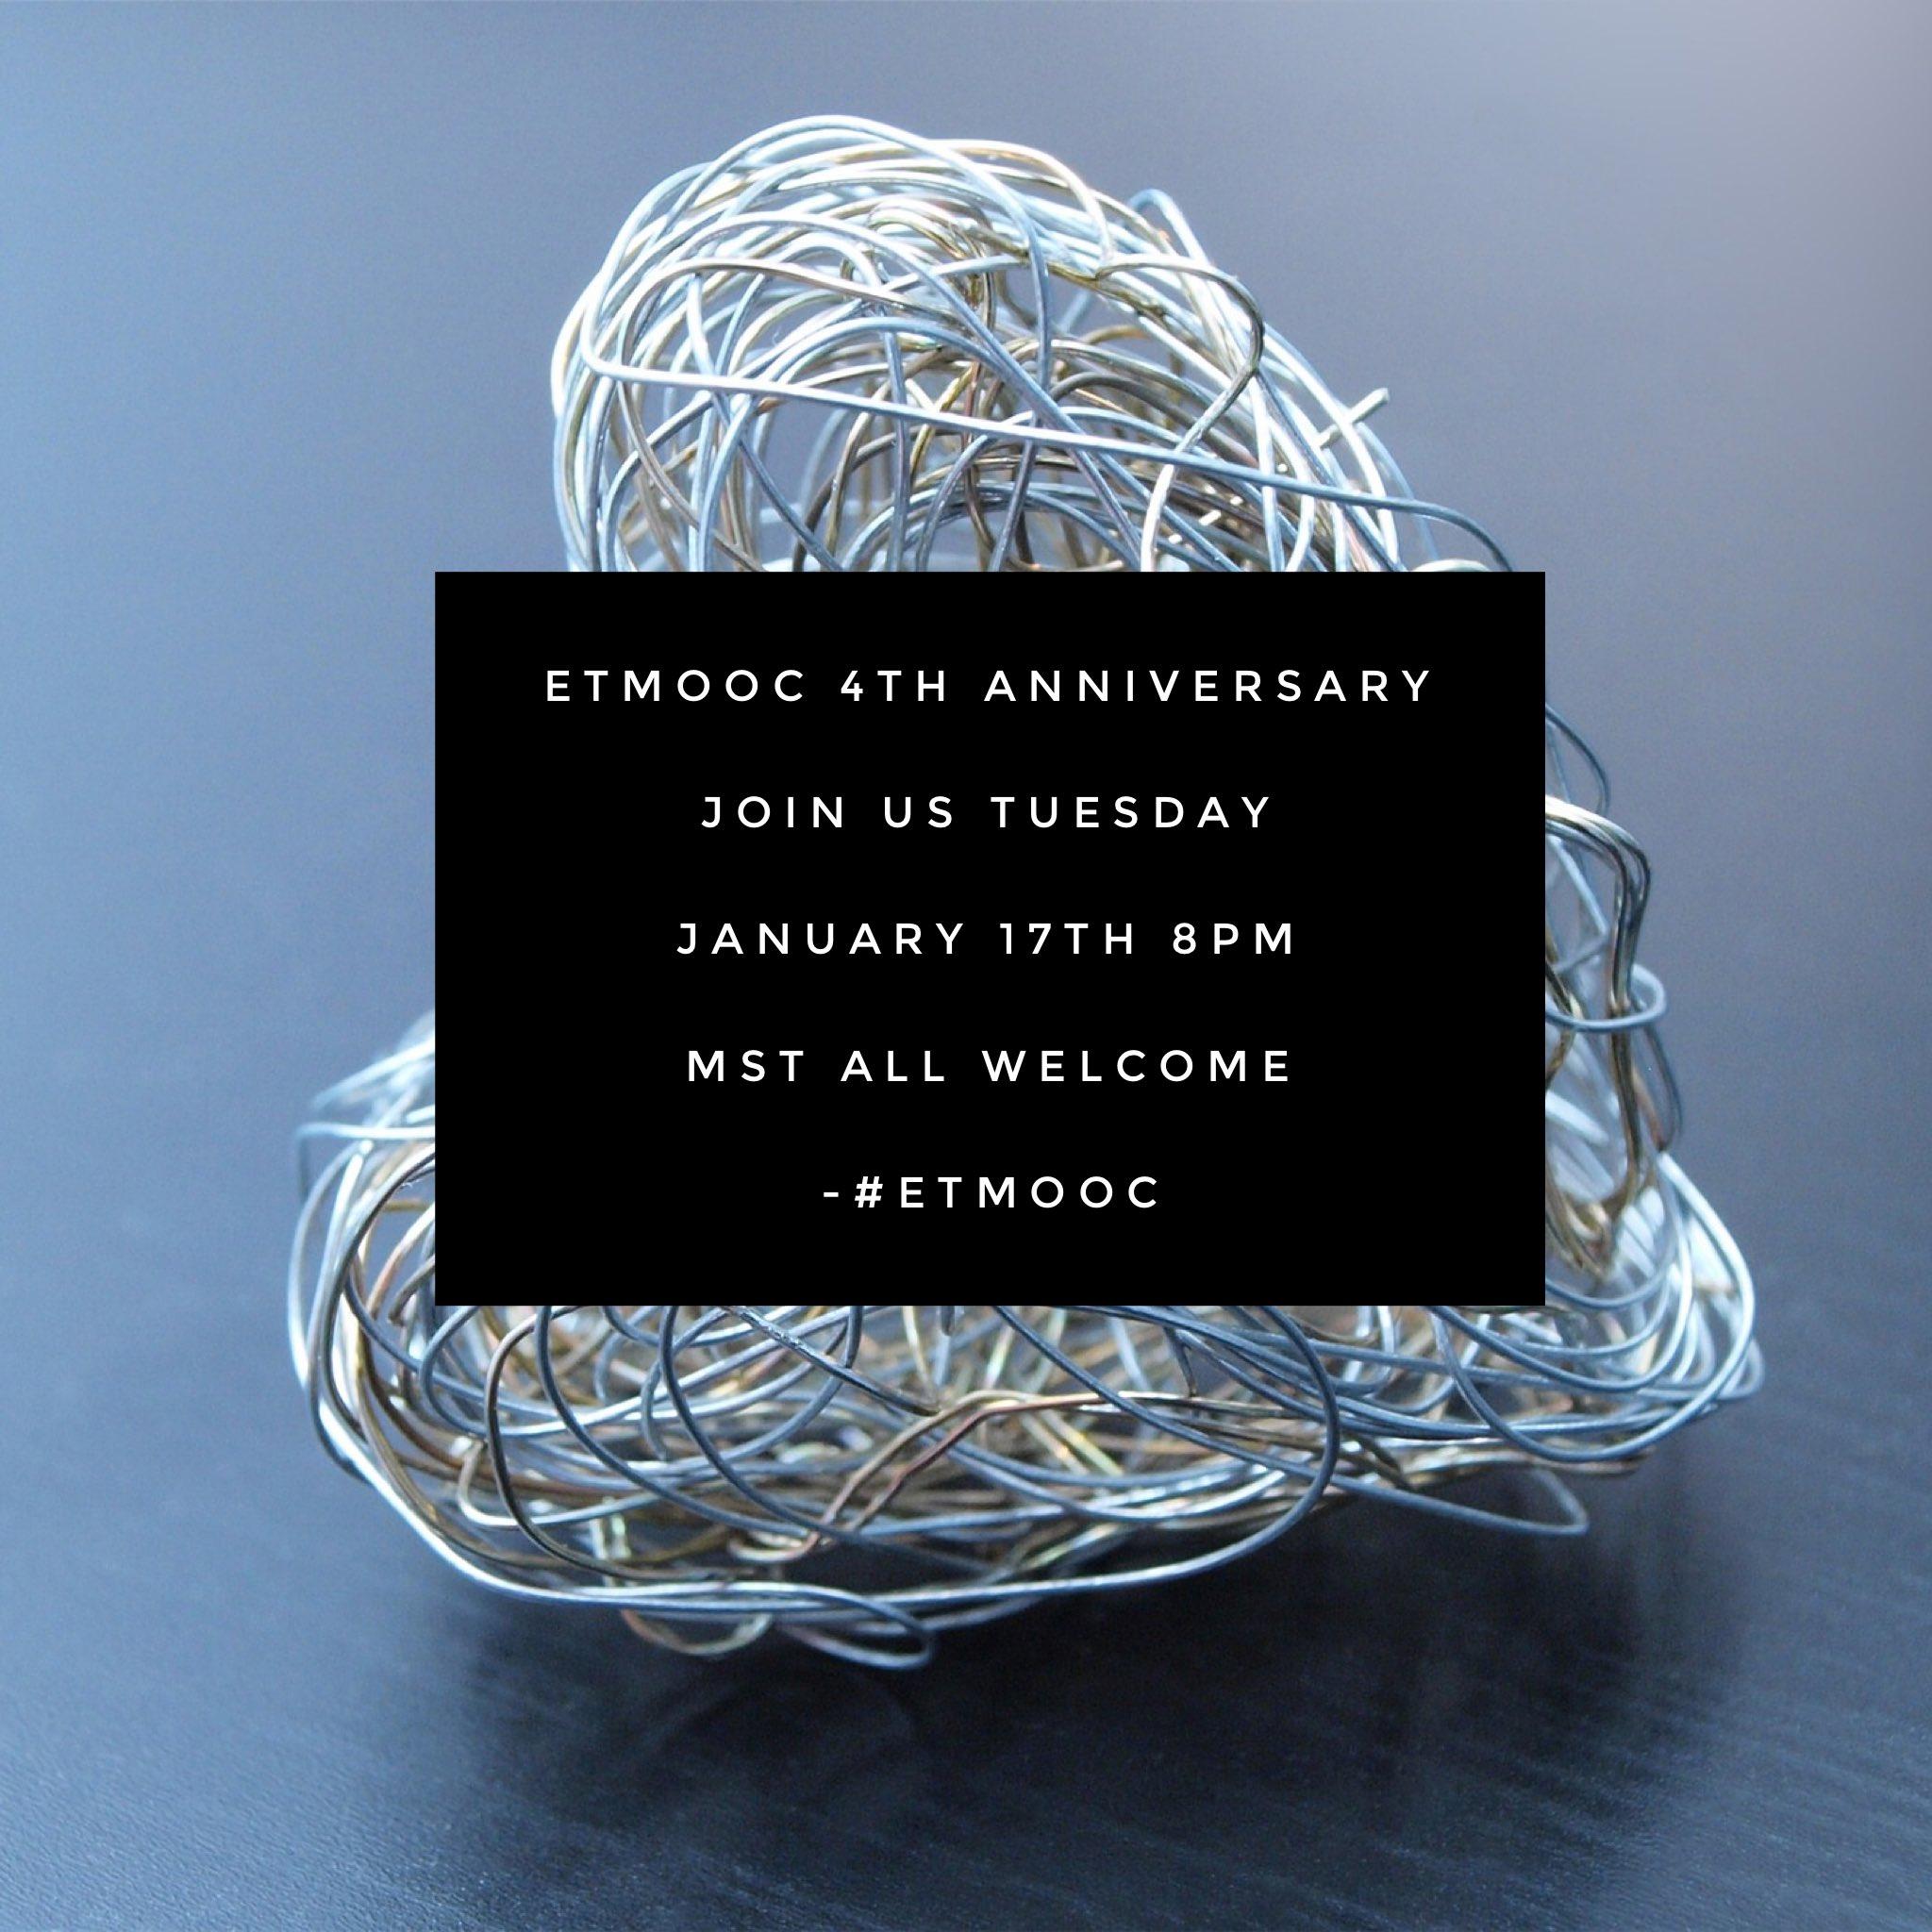 Thumbnail for #etmooc 4th Anniversary Tweet Chat: The cMOOC That Still Won't Die!